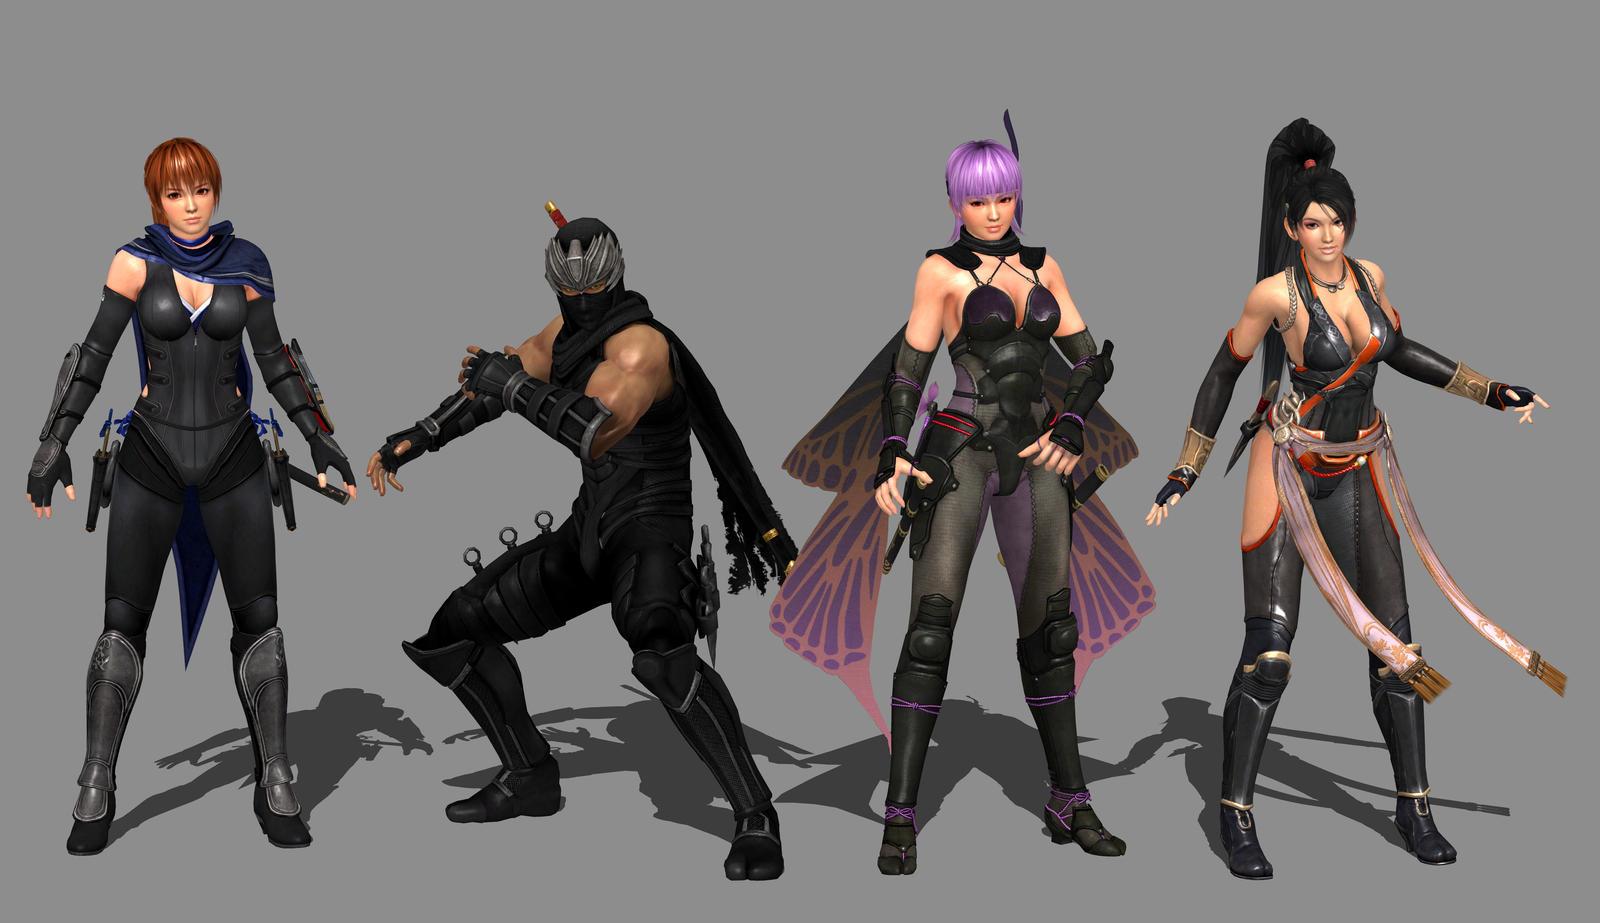 ninja gaiden 3 ps3 iso